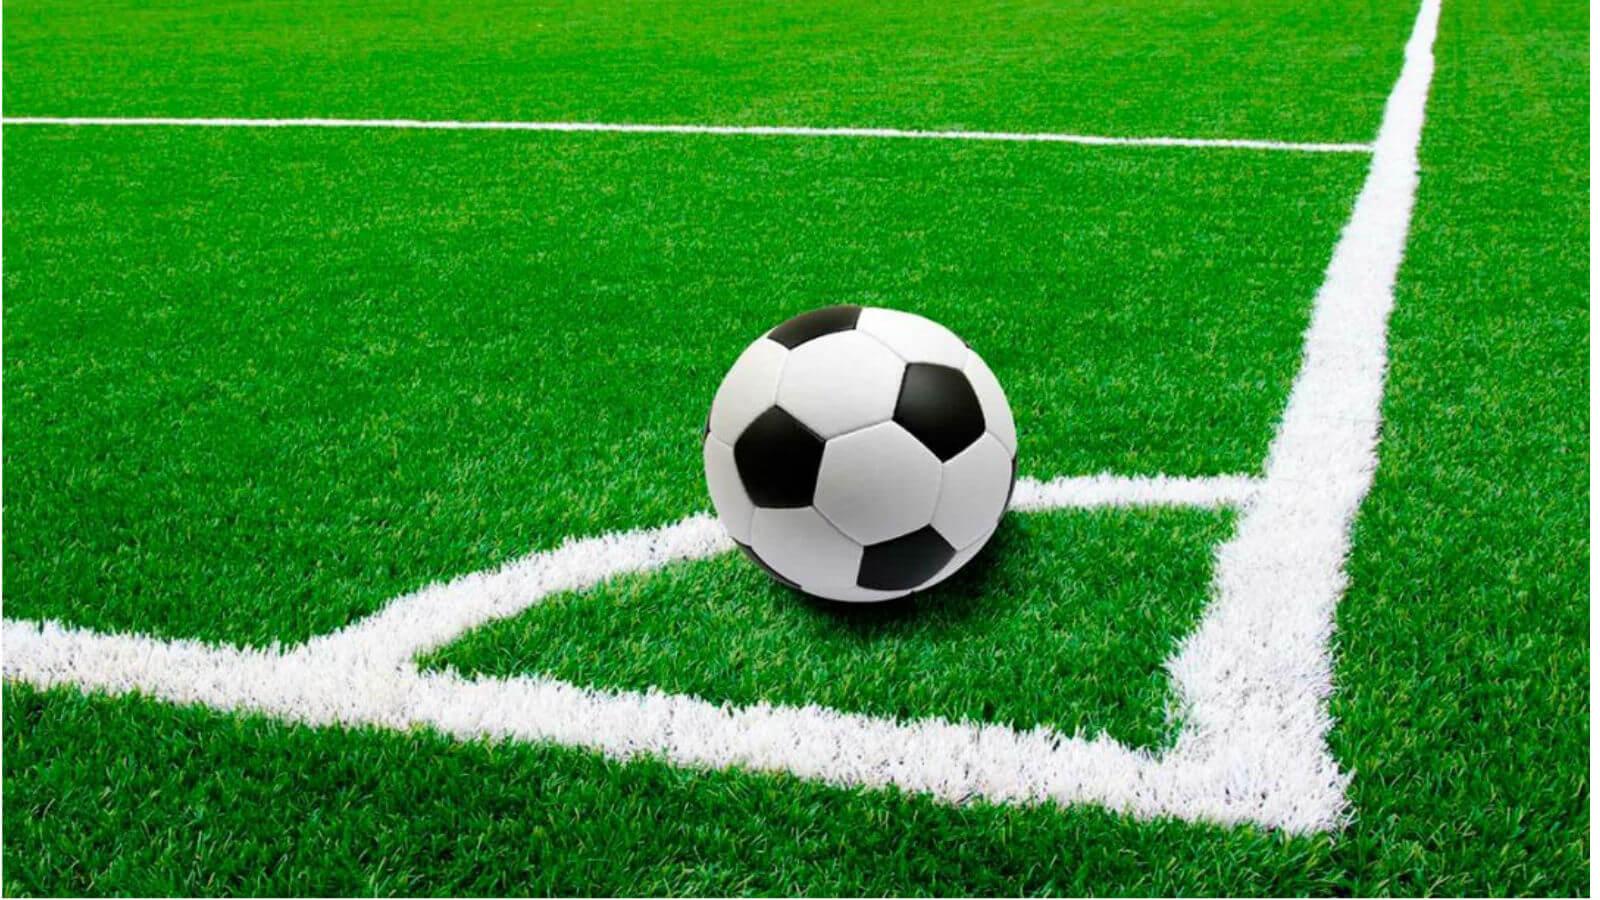 Ставки на угловые в футболе стратегия винлайн фонбет